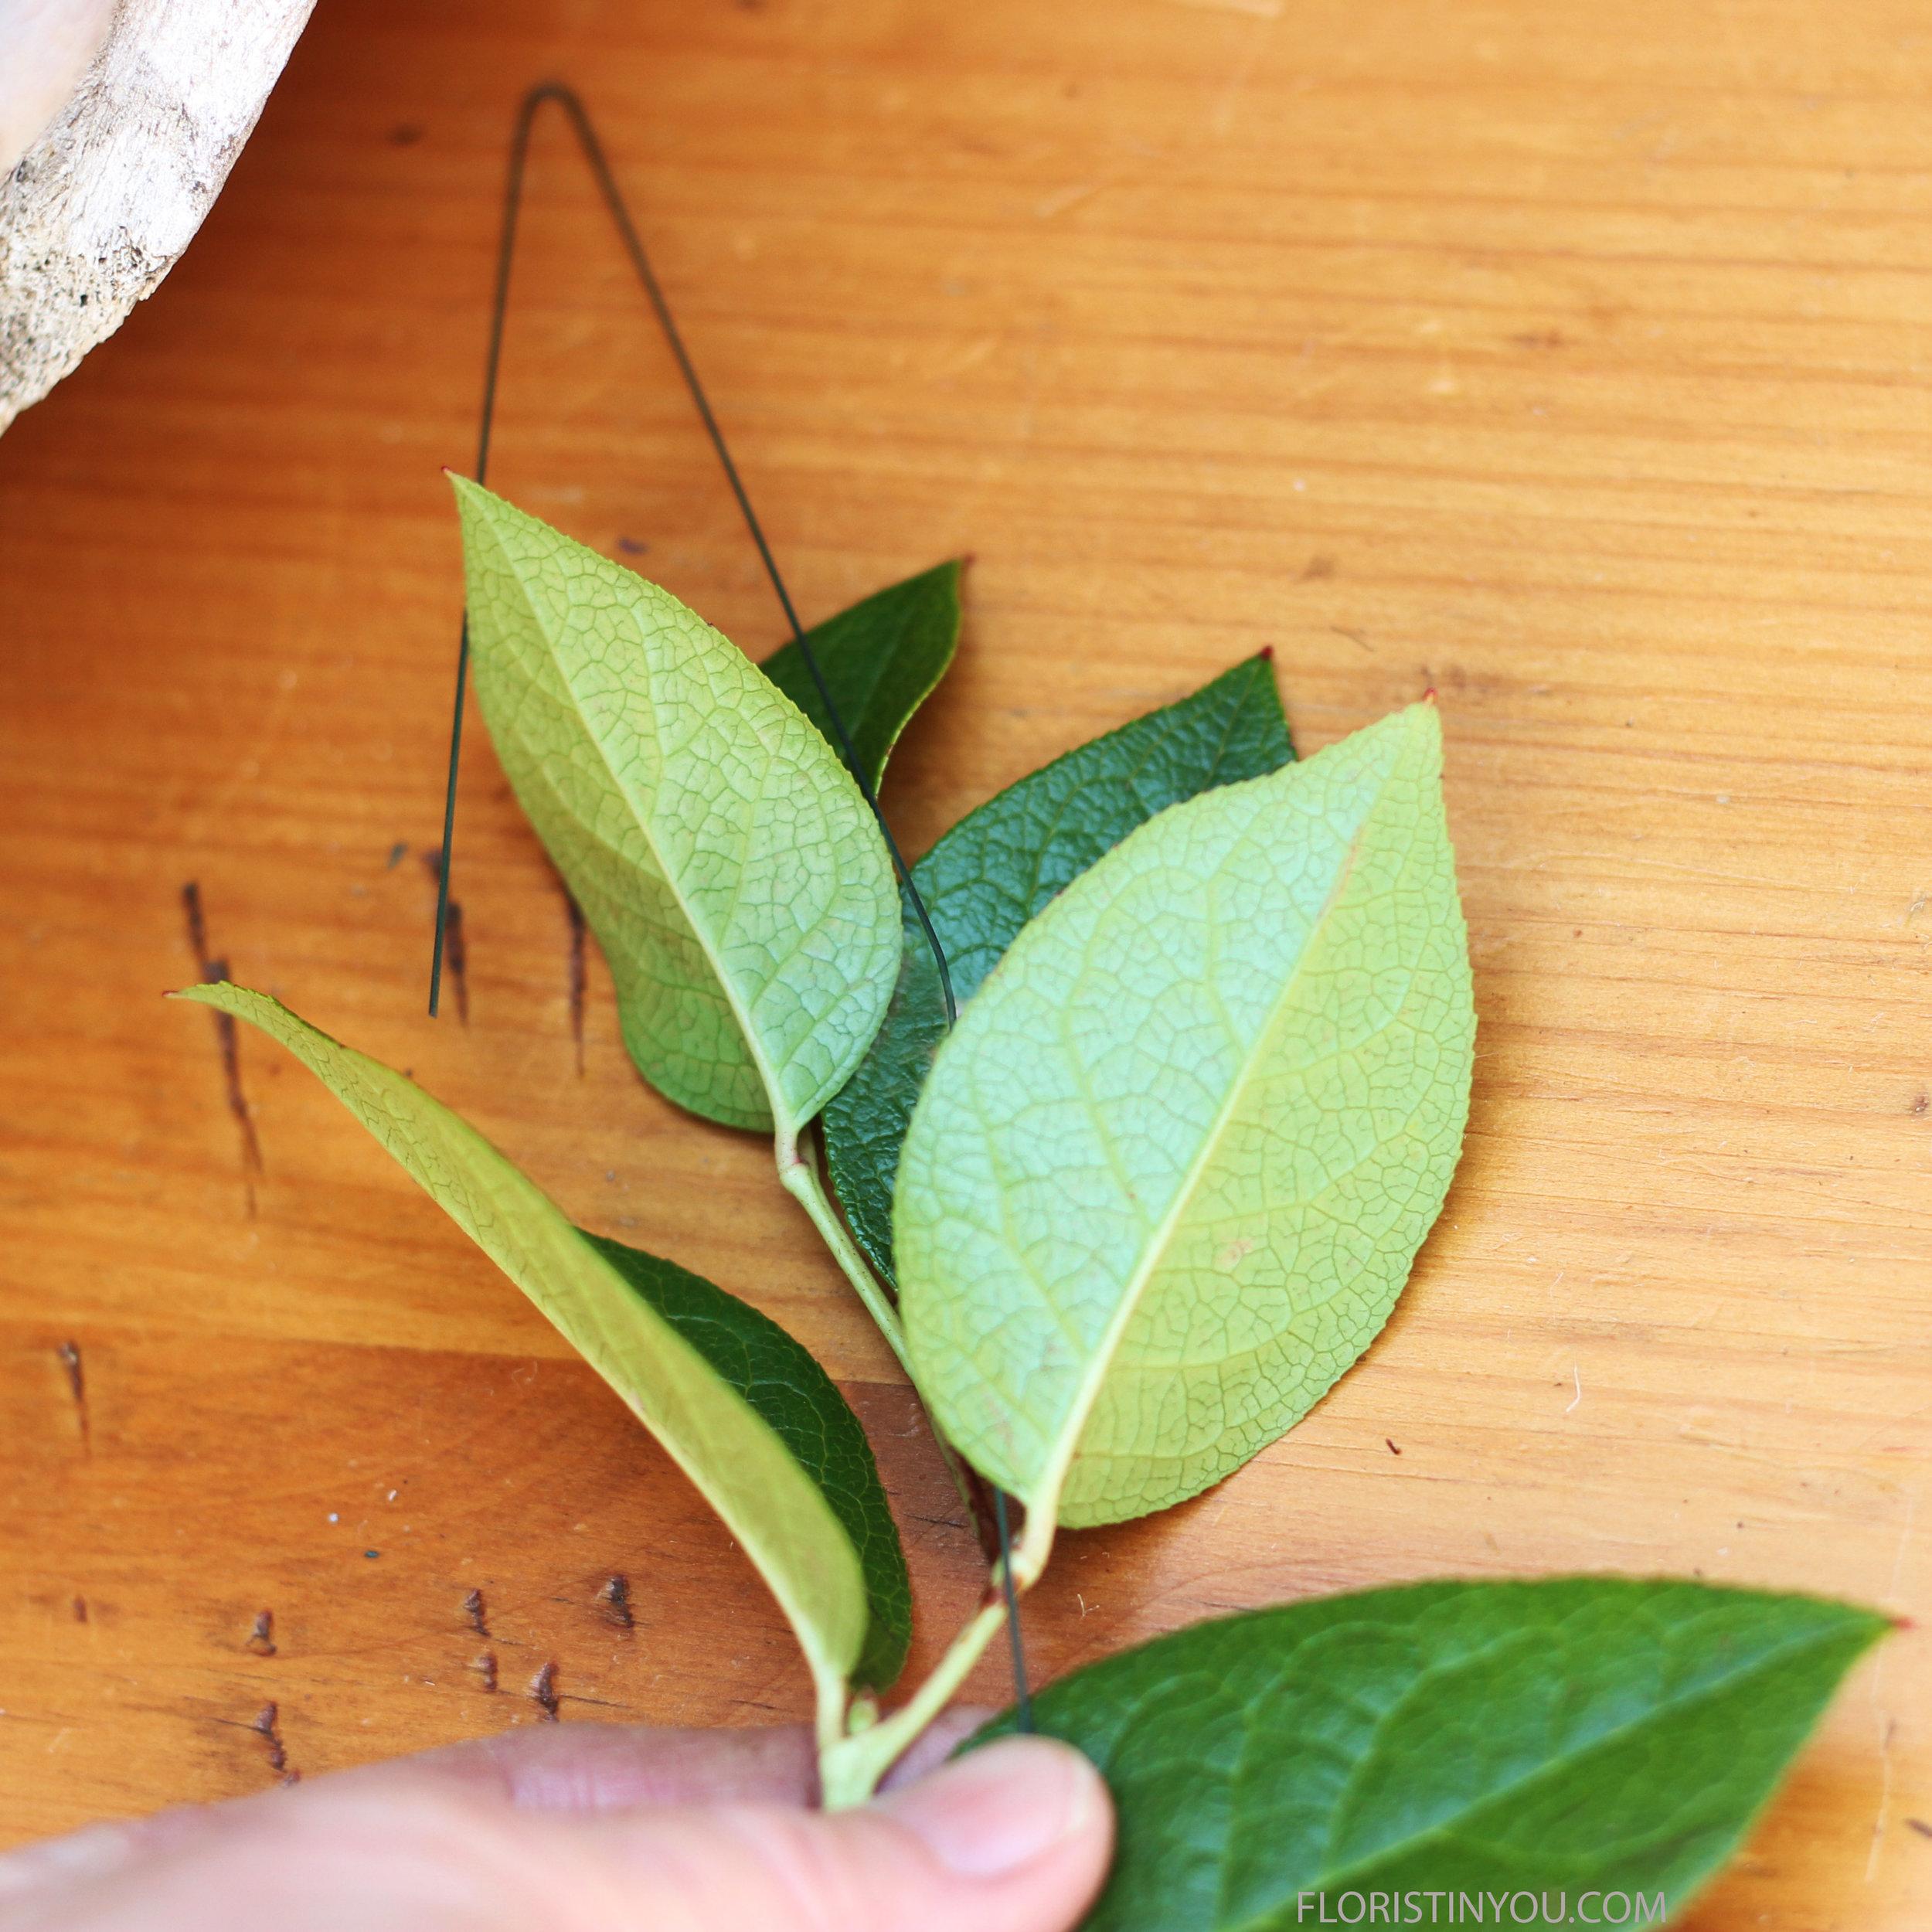 You begin the Lemon Leaf wrap the same way as the Coffee Bean Wrap.